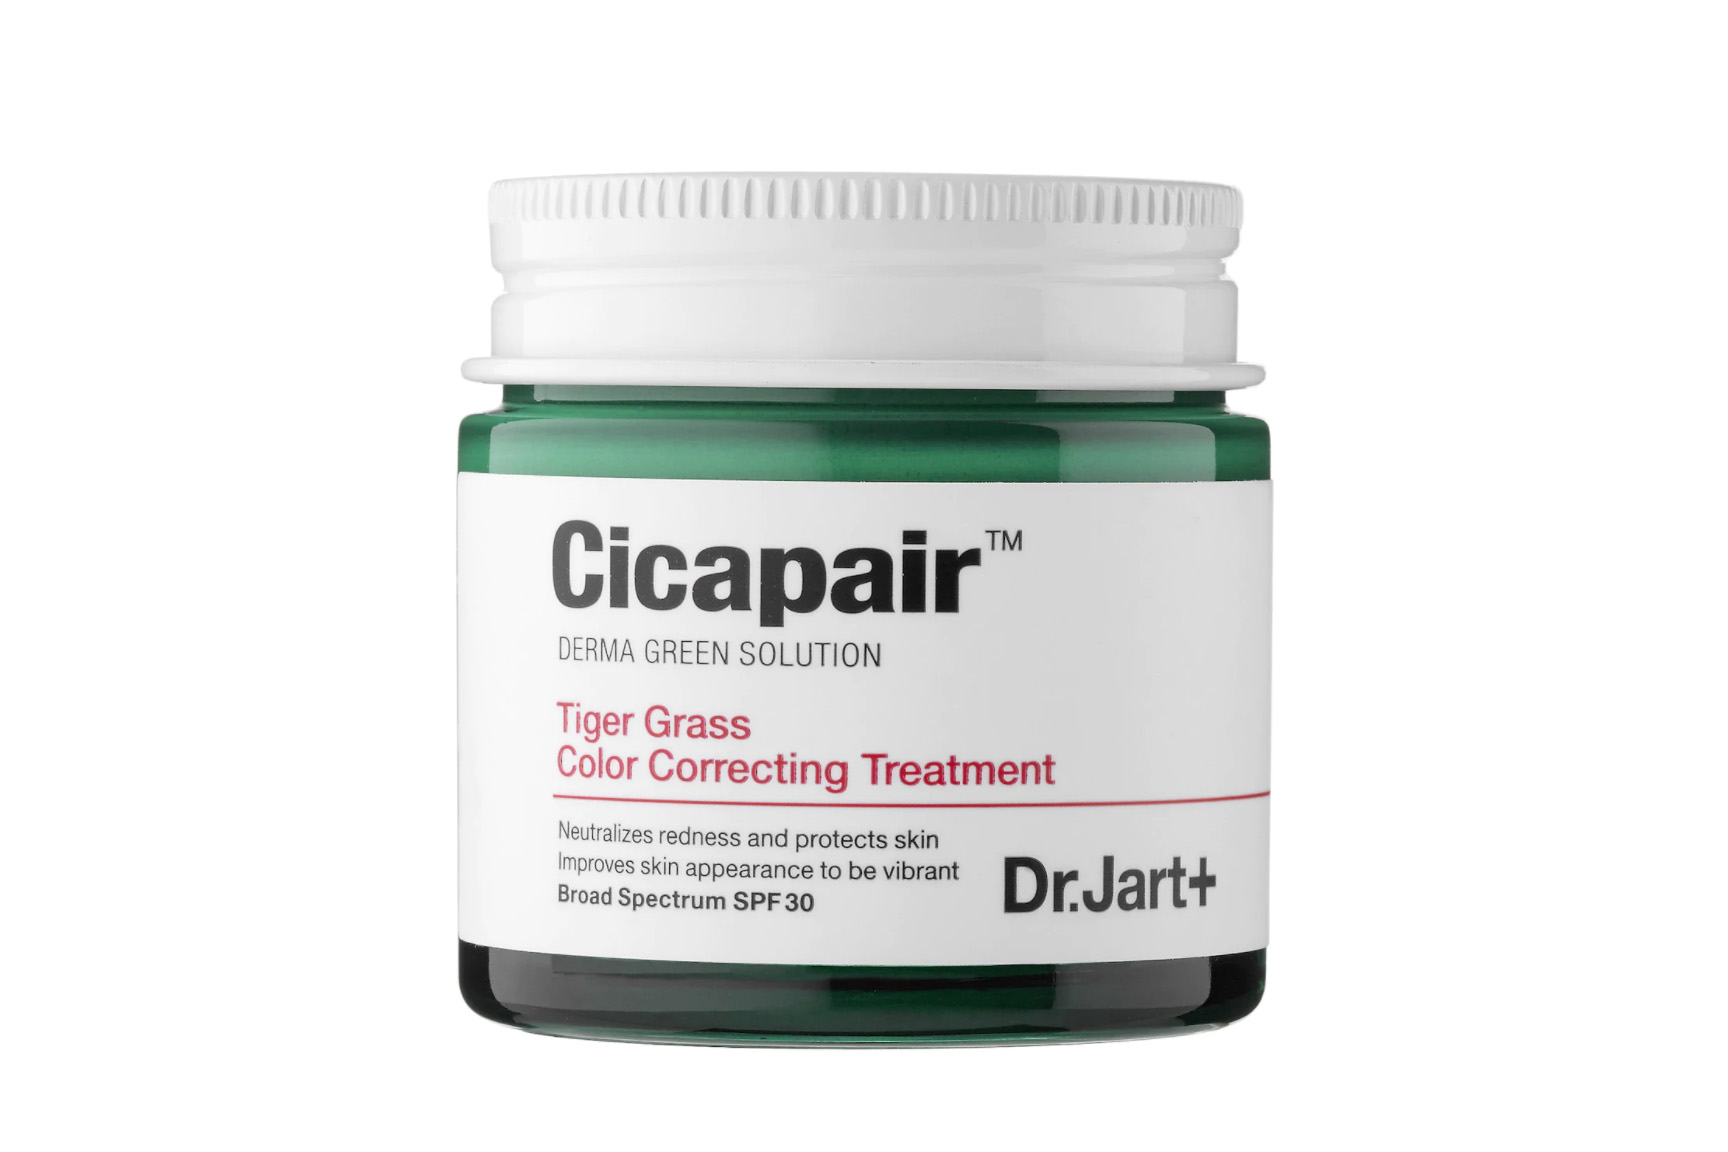 retinol alternatives cica centenella asiatica dr. jart+